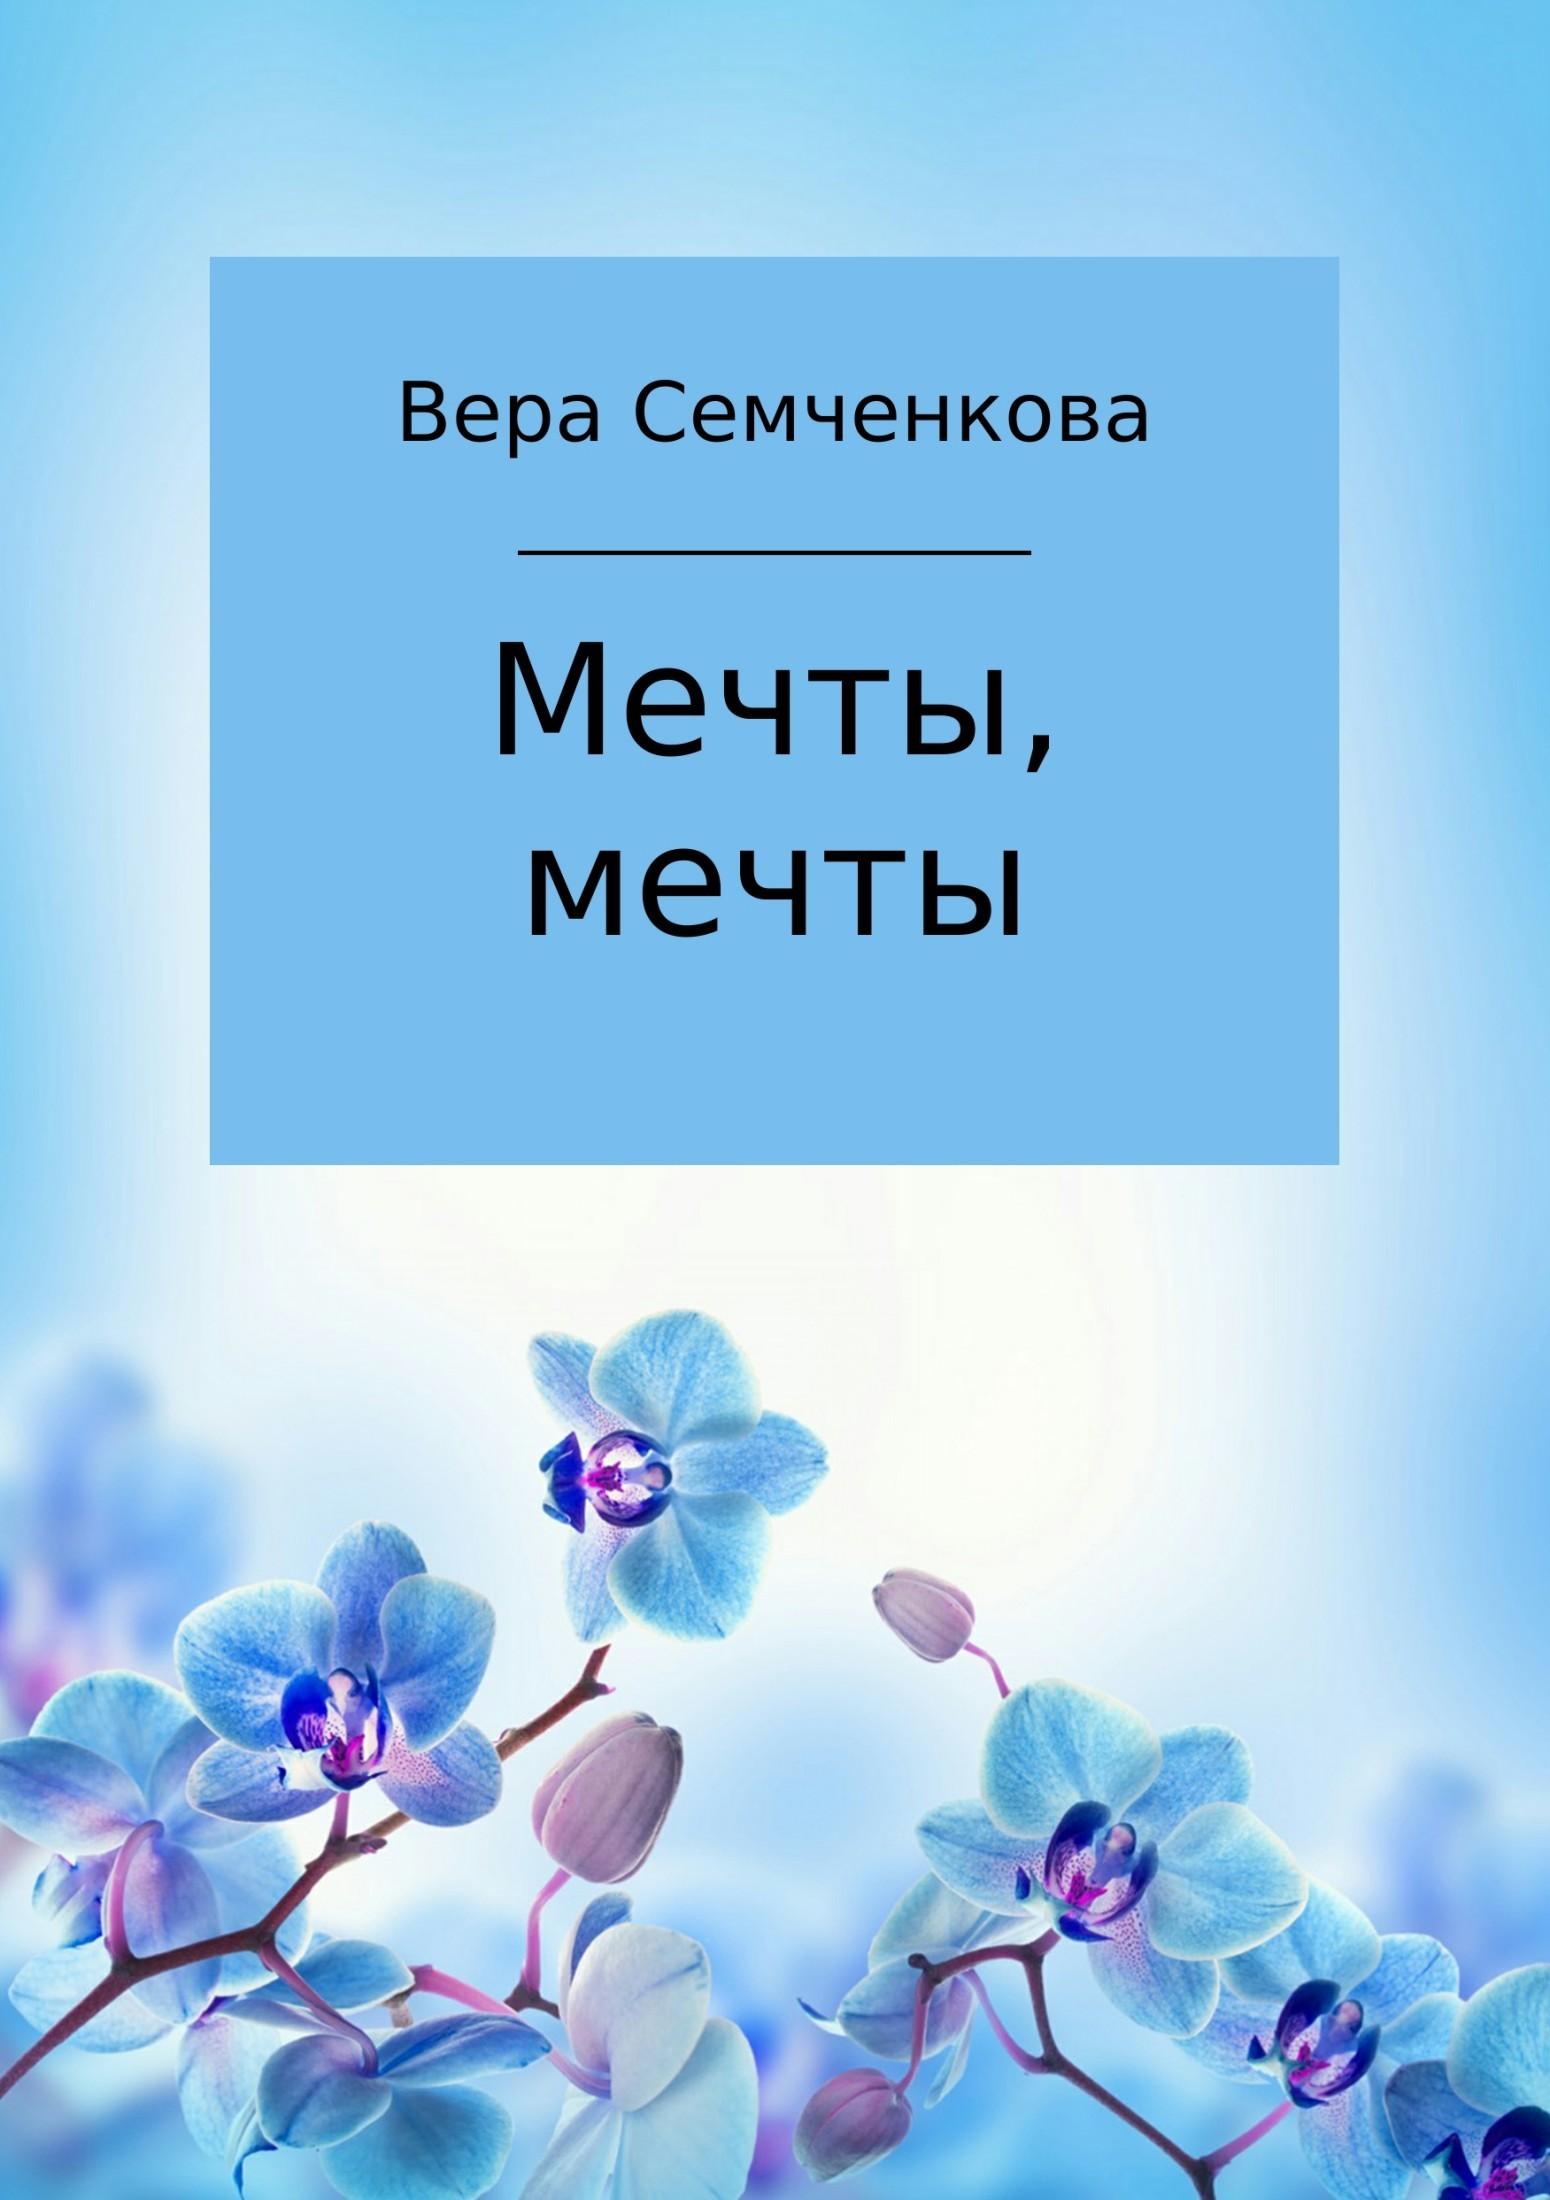 Вера Семченкова - Мечты, мечты